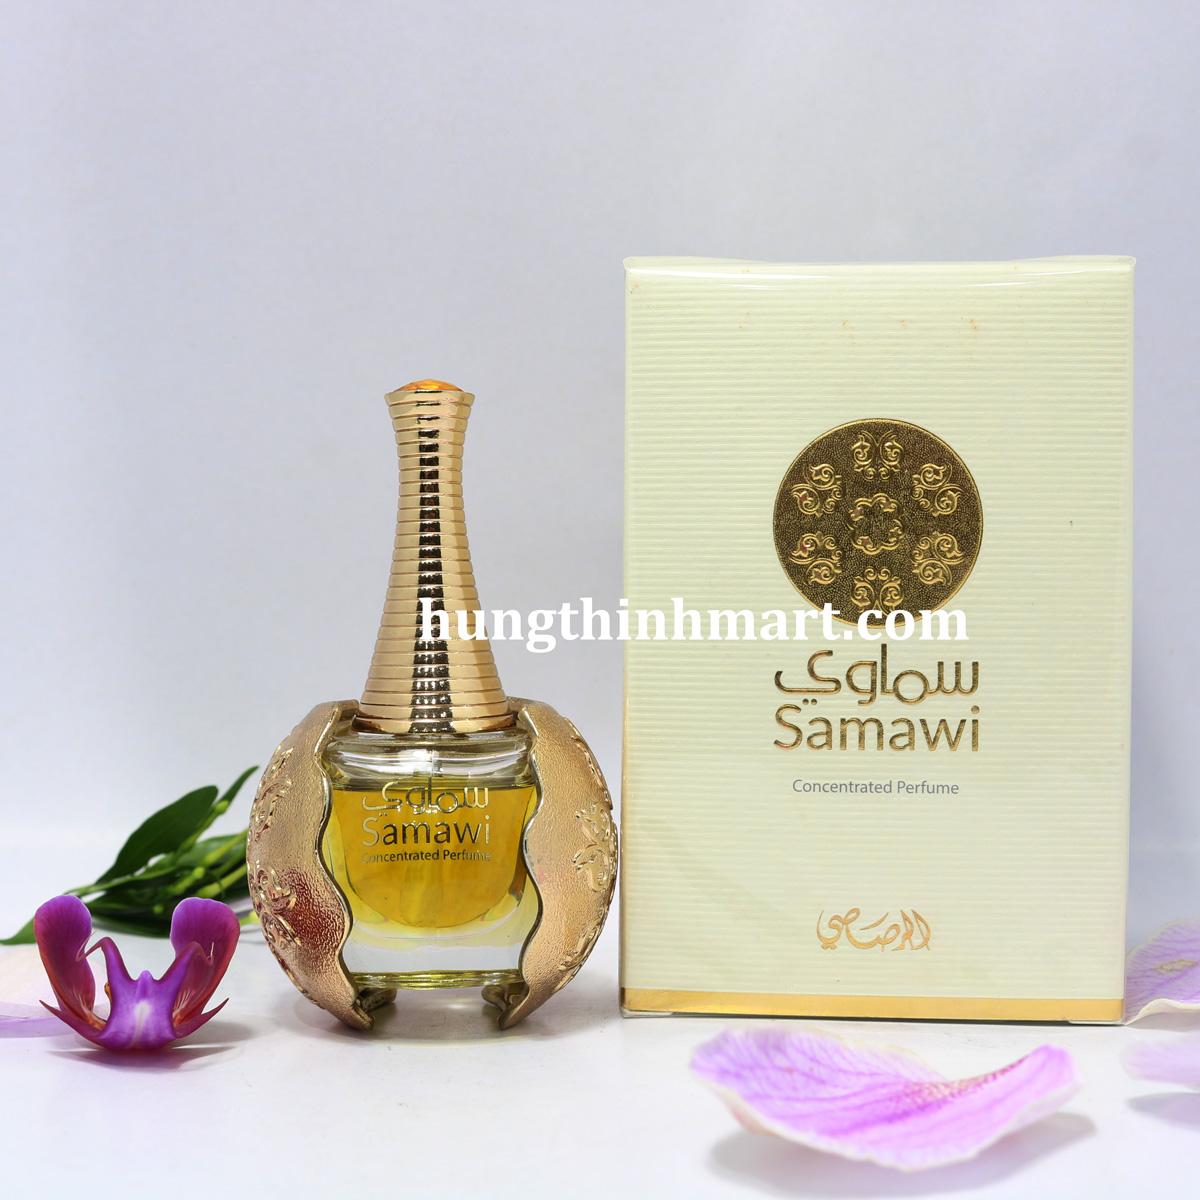 Tinh dầu nước hoa Dubai Samawi thơm dai